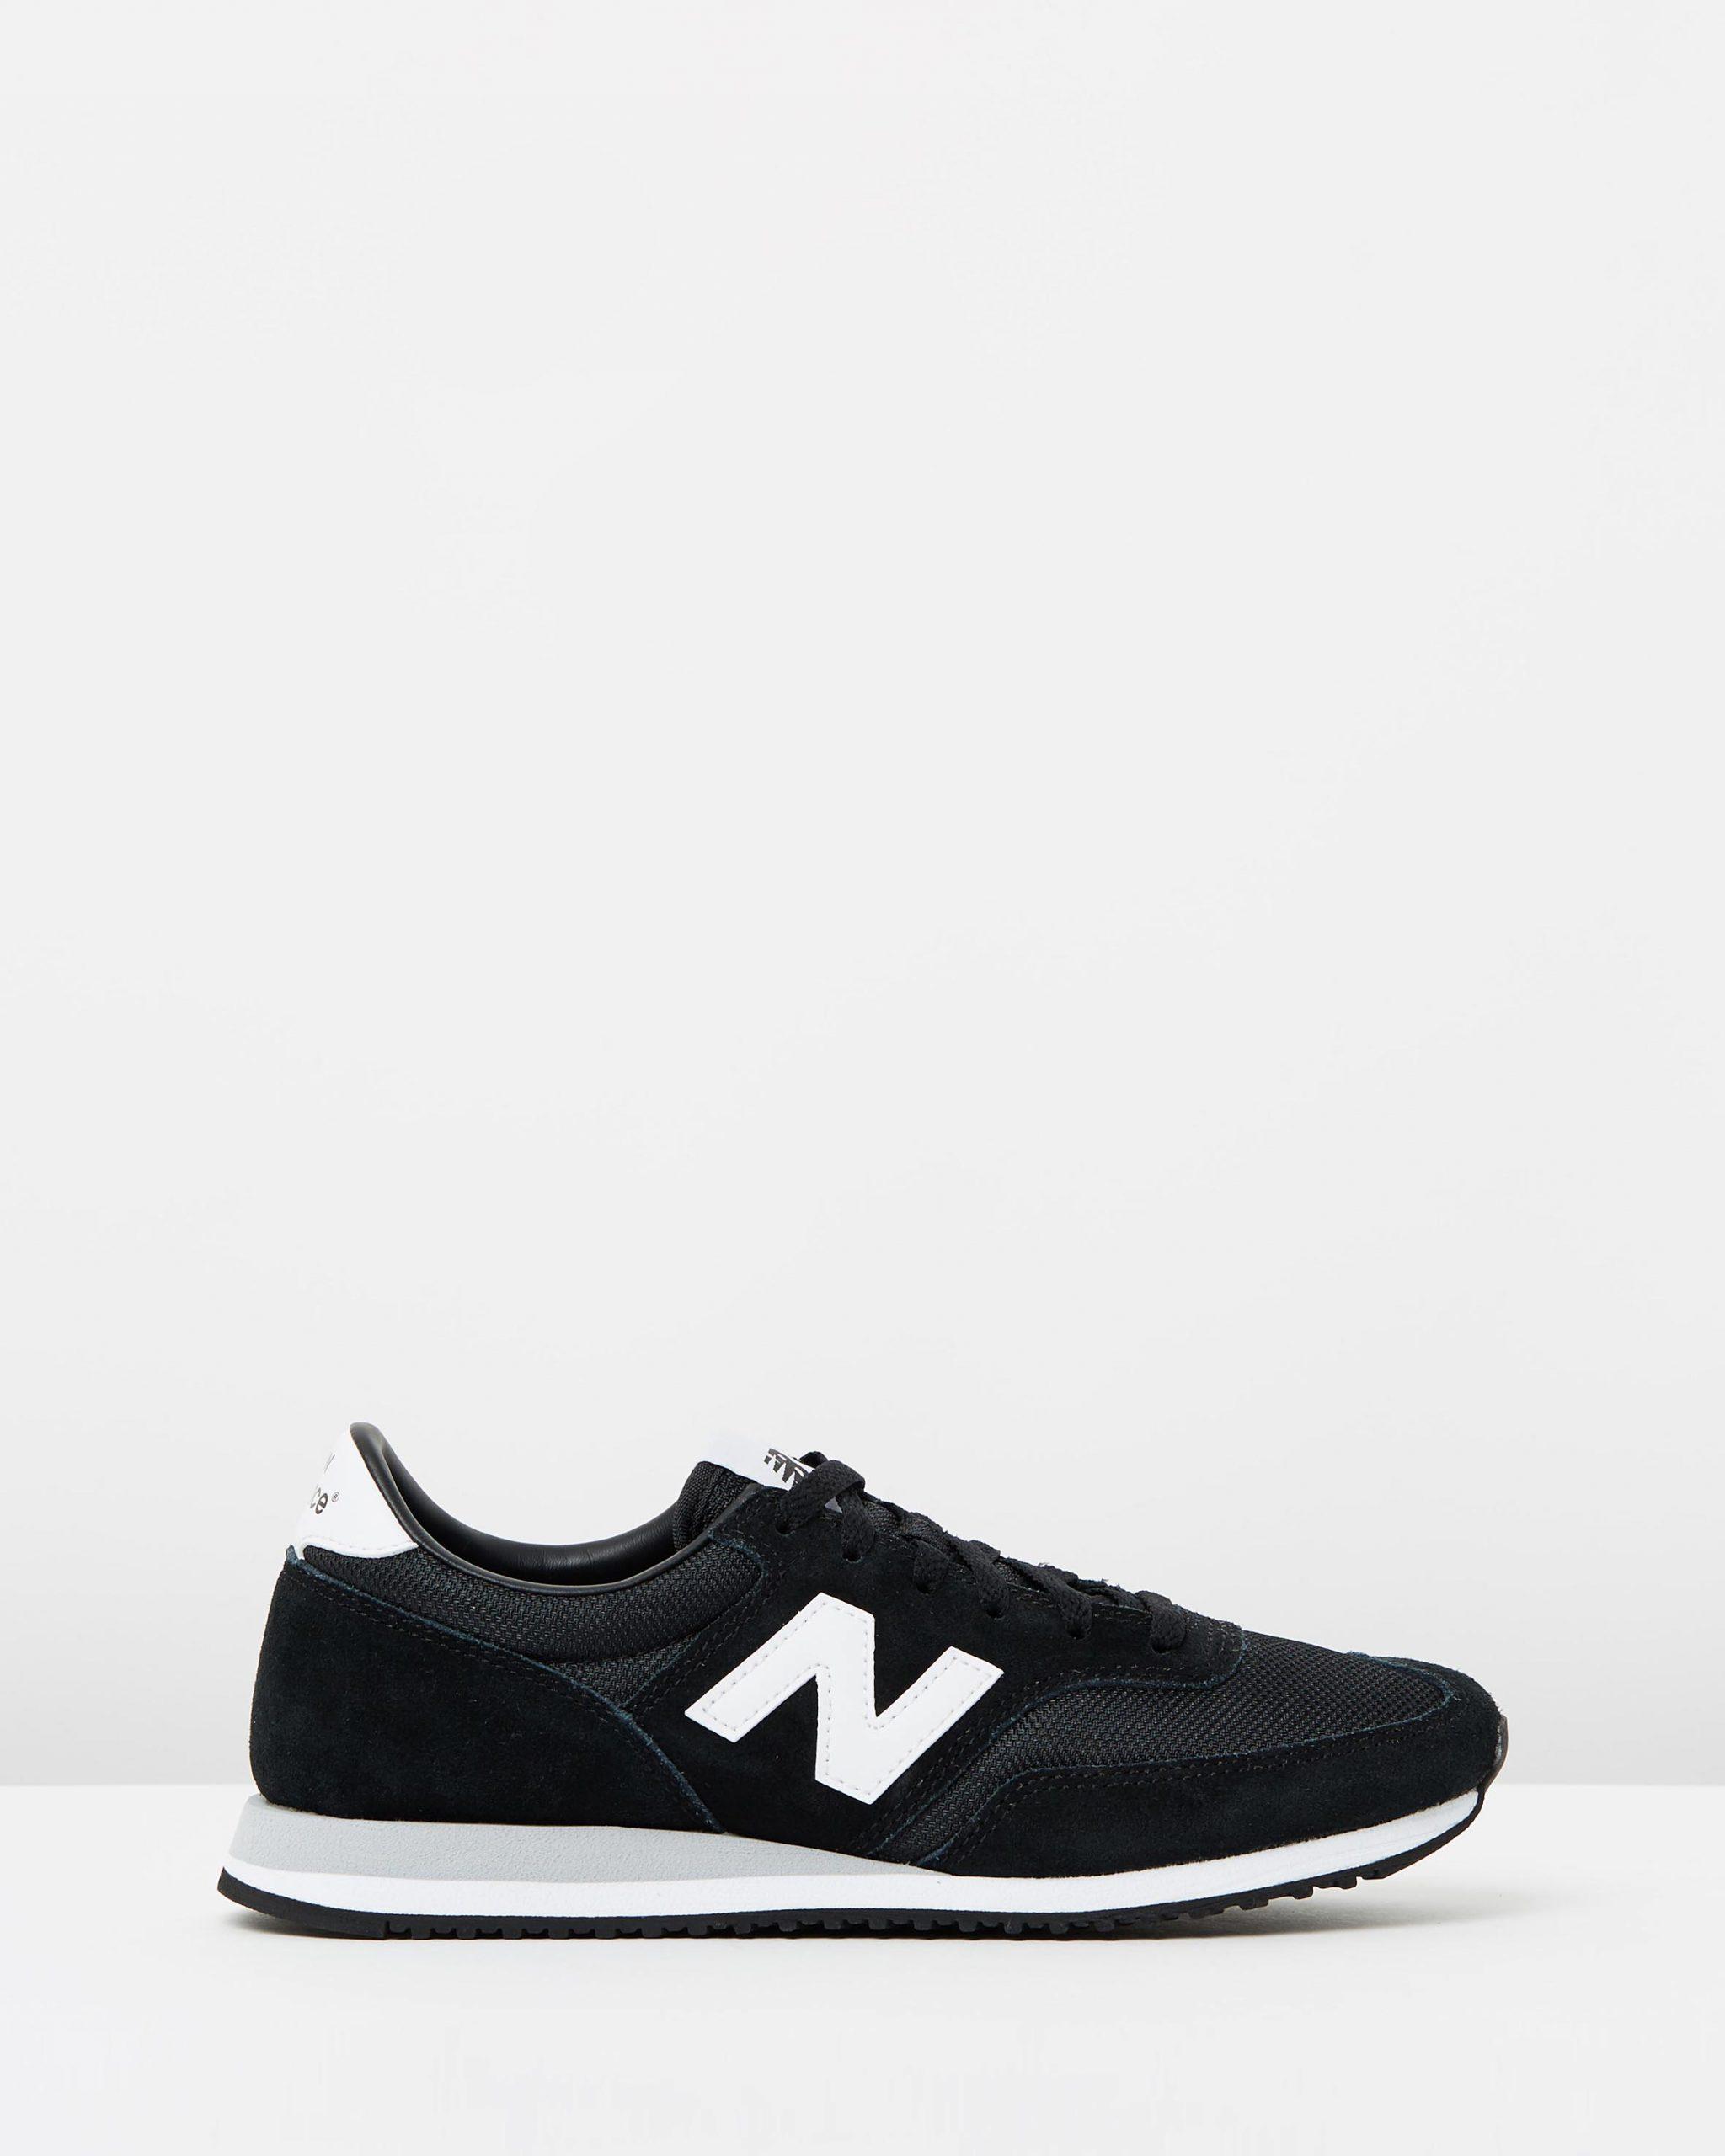 New Balance Classics 620 Black